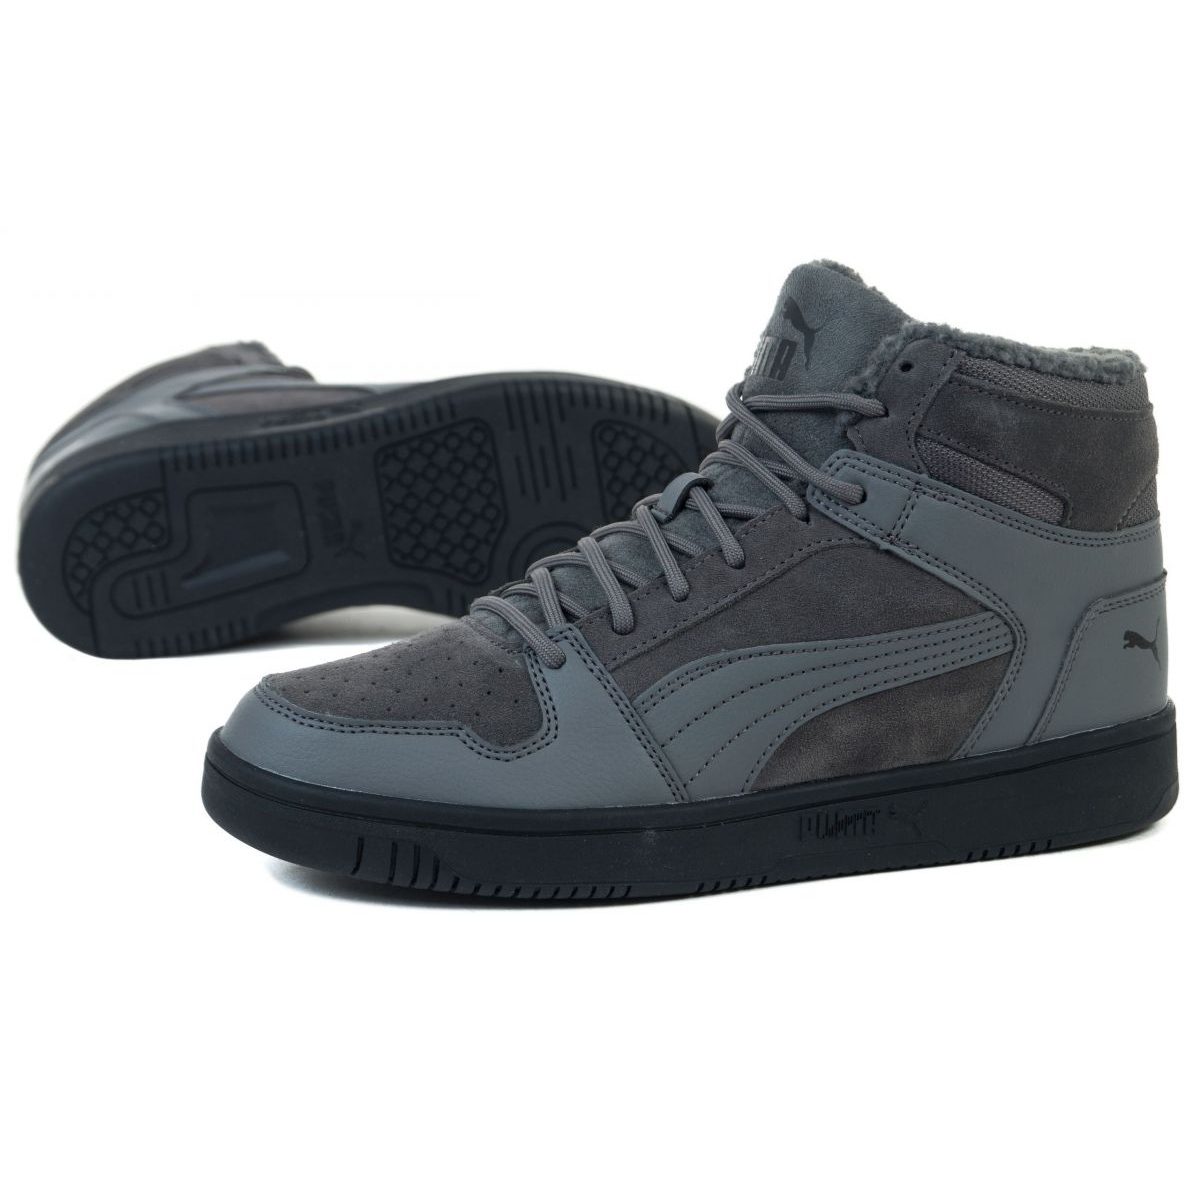 Puma Rebound Layup Sd Fur M 369831 02 grey - KeeShoes